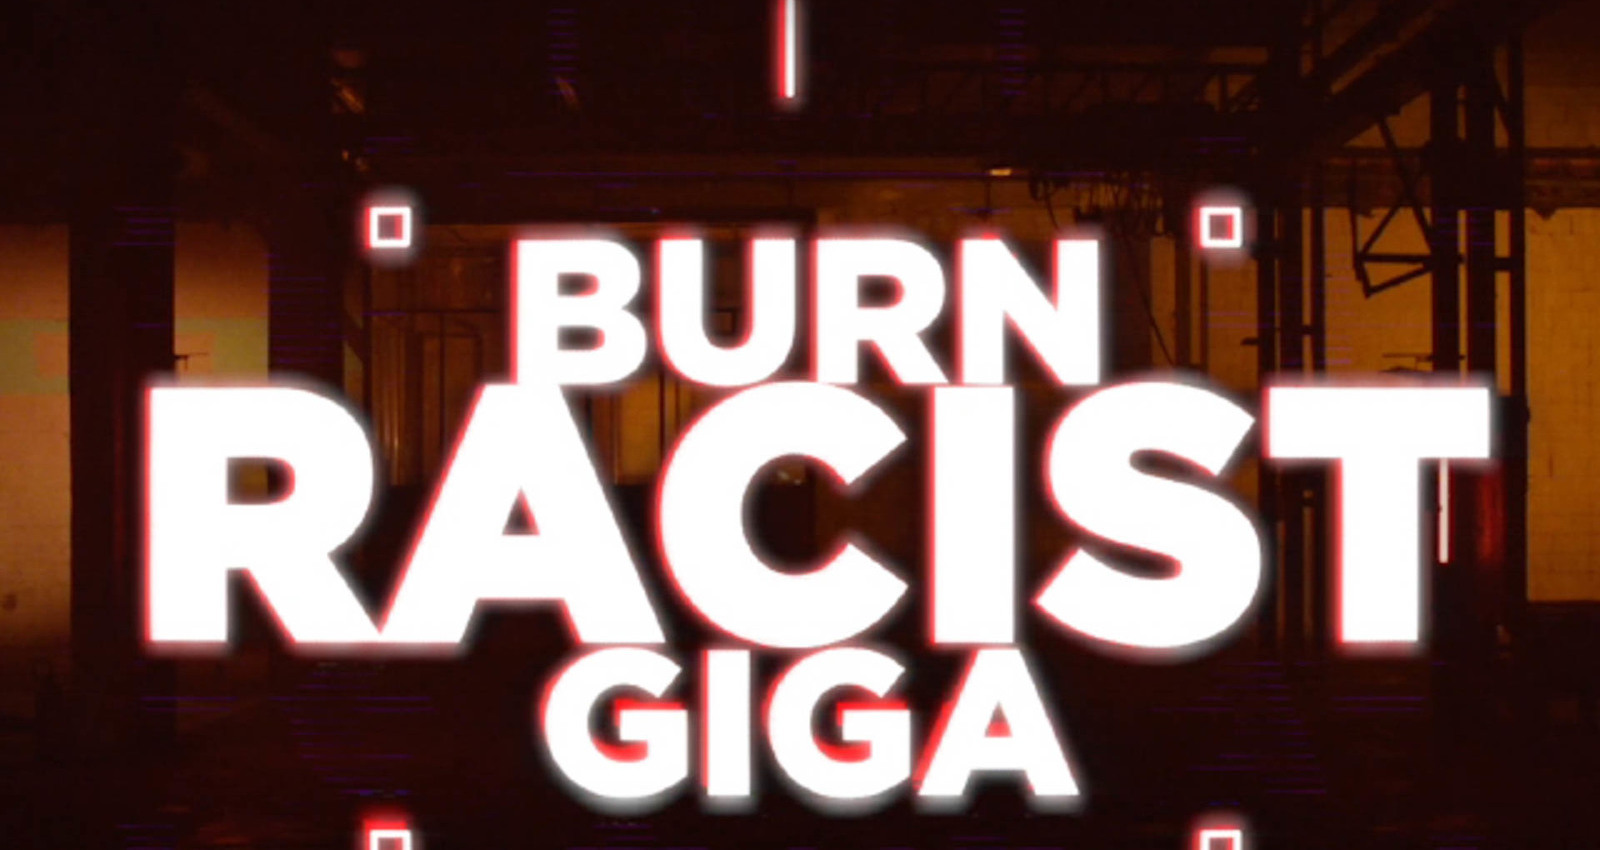 Burn Racist Giga